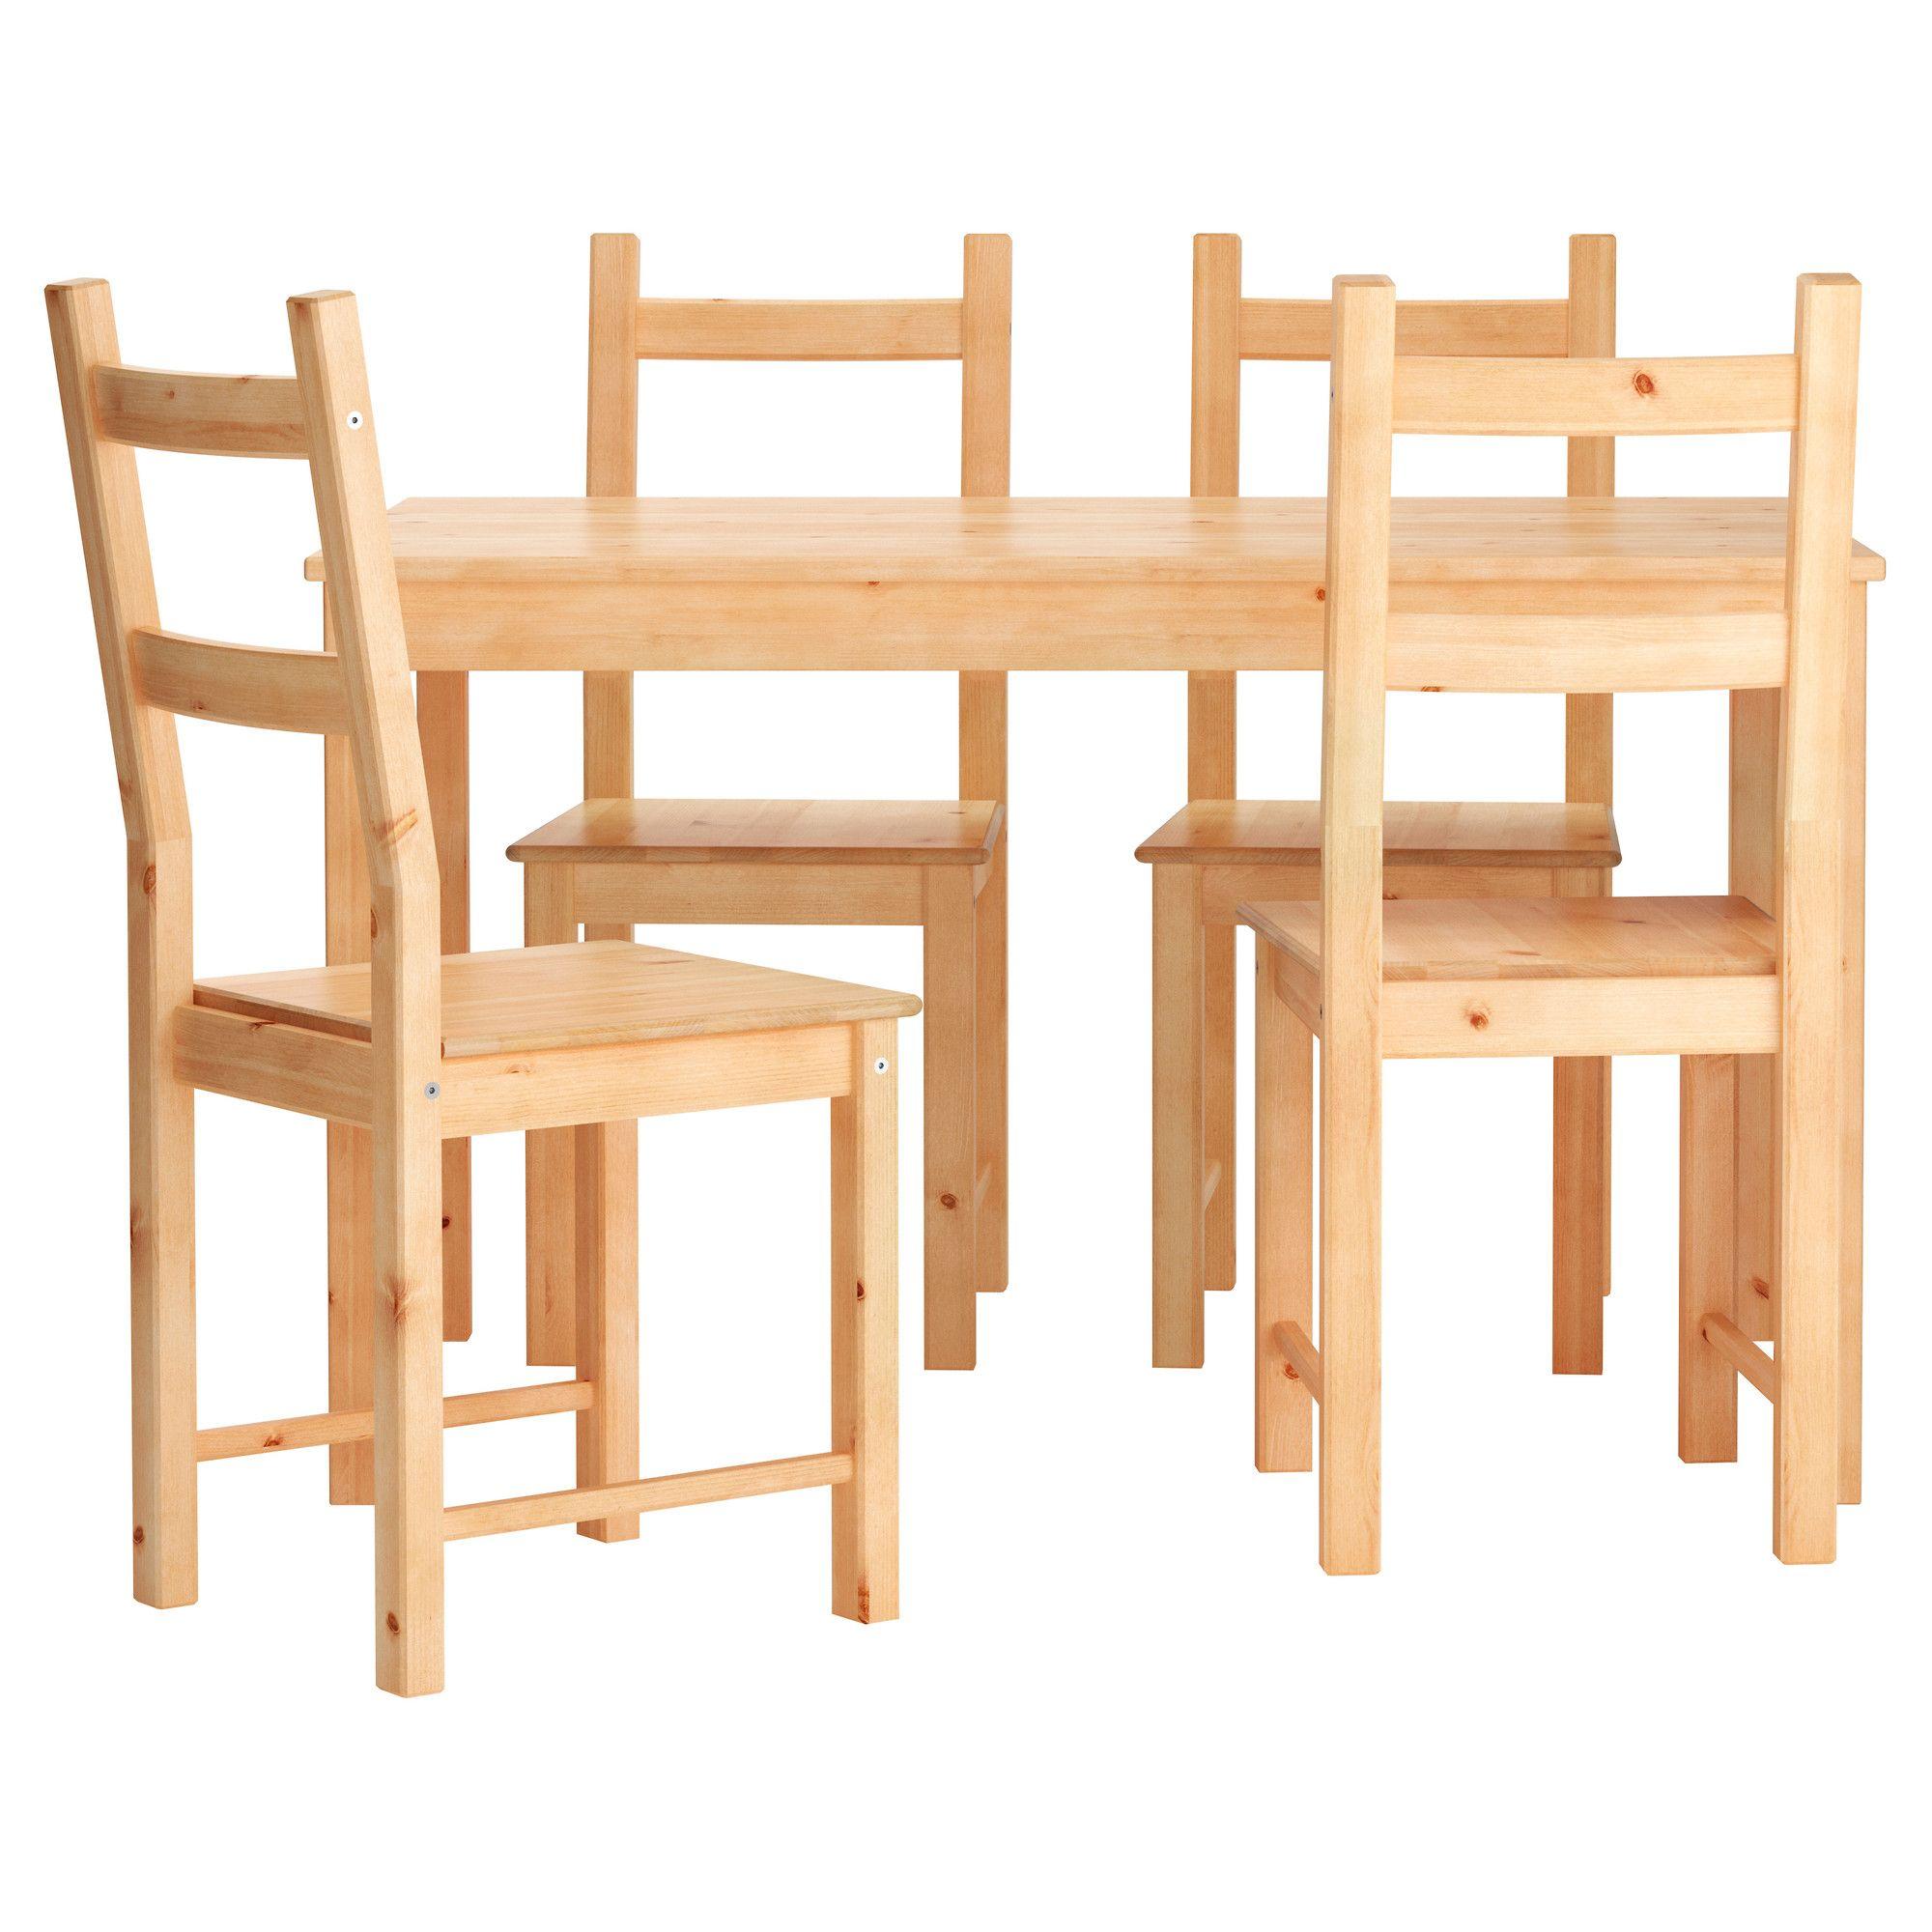 Ikea Us Furniture And Home Furnishings Ikea Dining Table Ikea